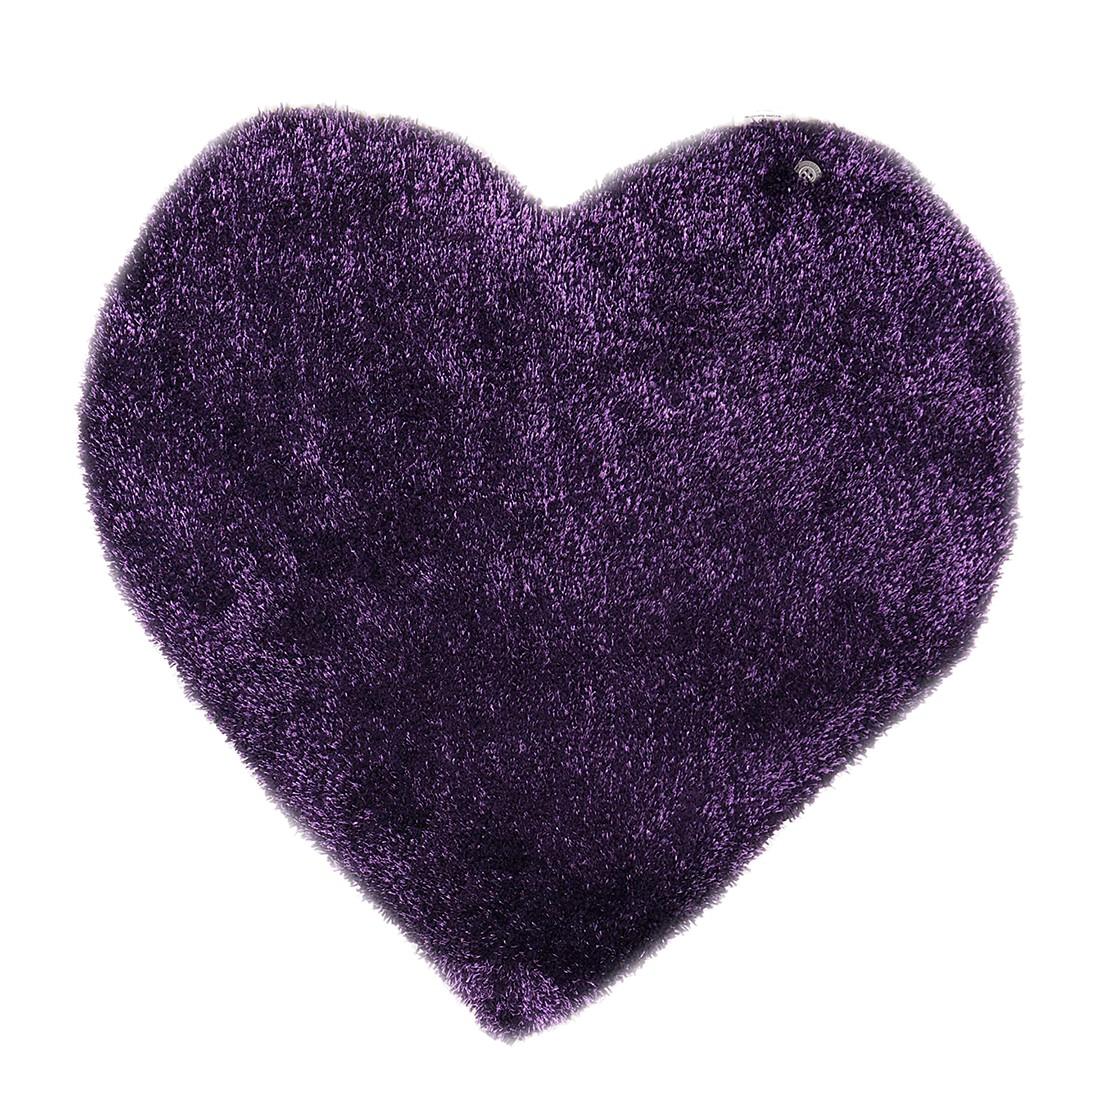 Teppich Soft Heart - Violett - Maße: 100 x 100 cm, Tom Tailor